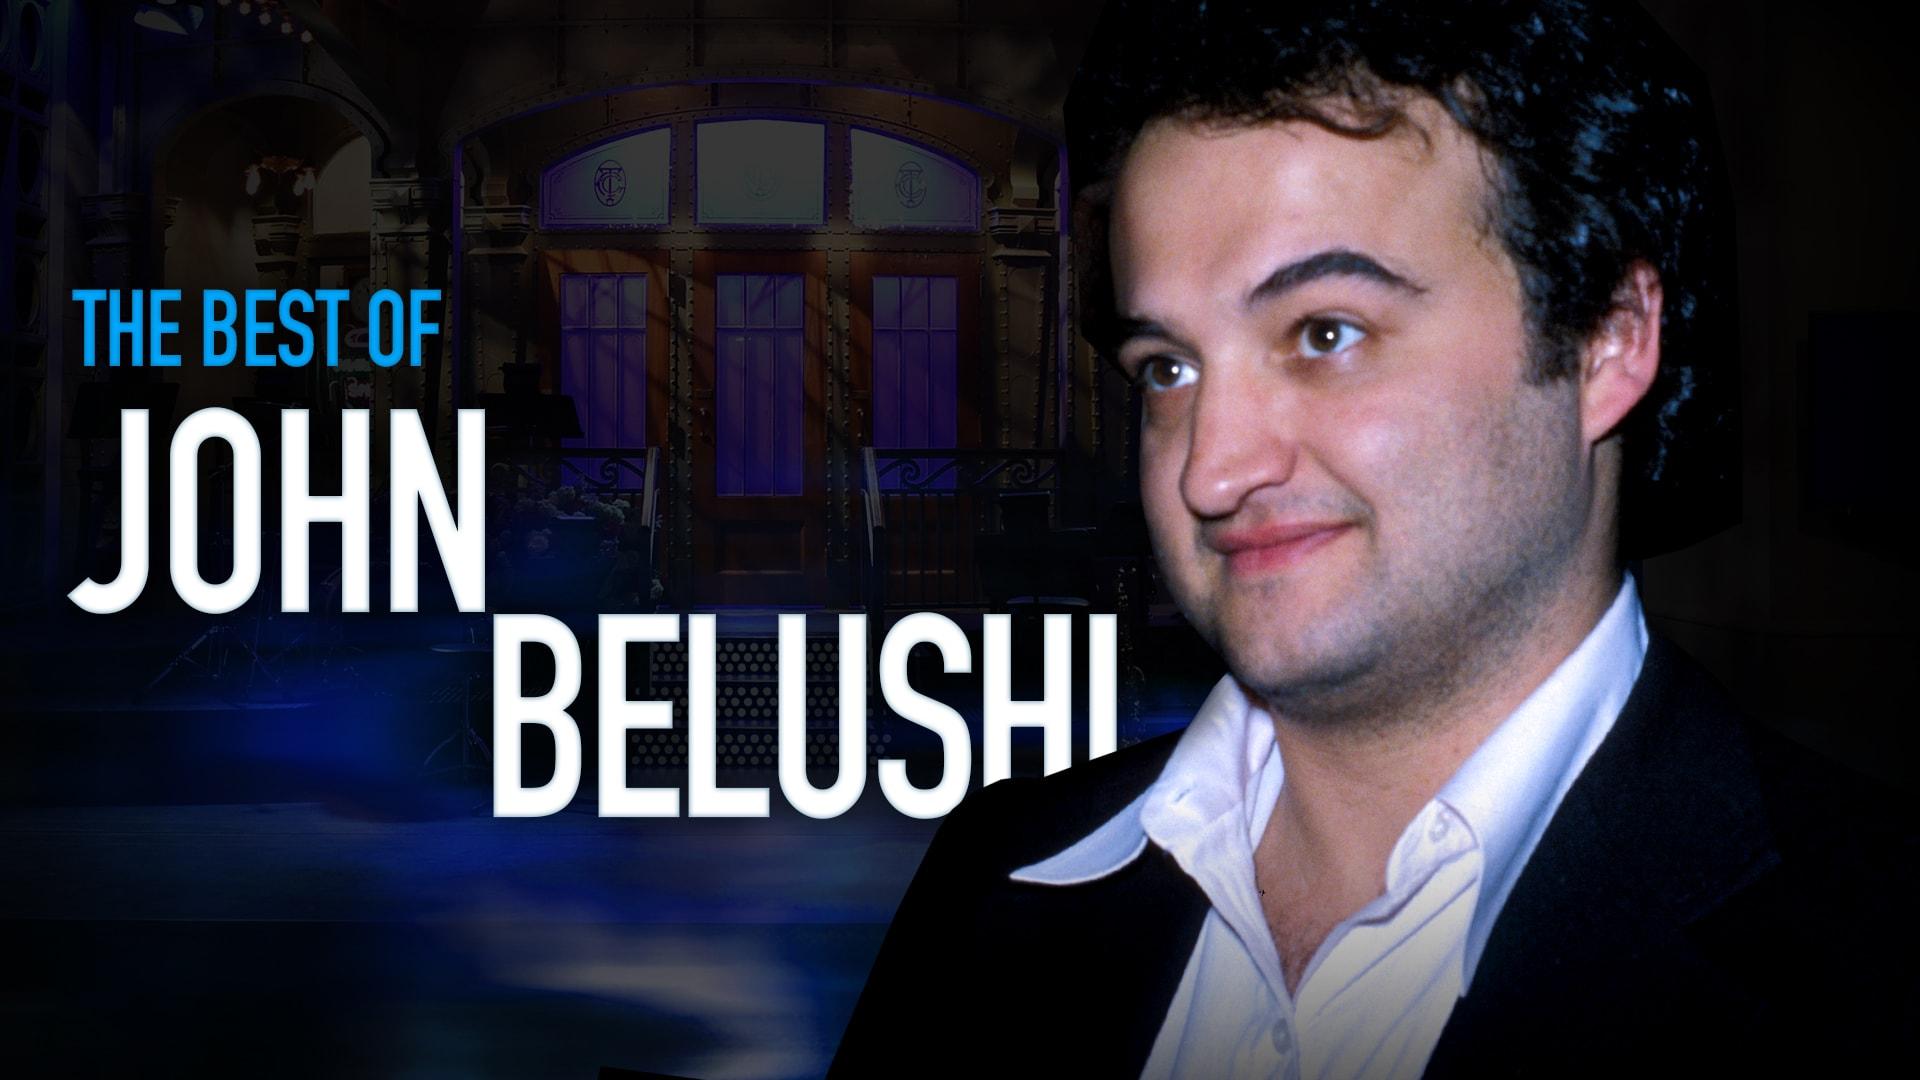 The Best of John Belushi